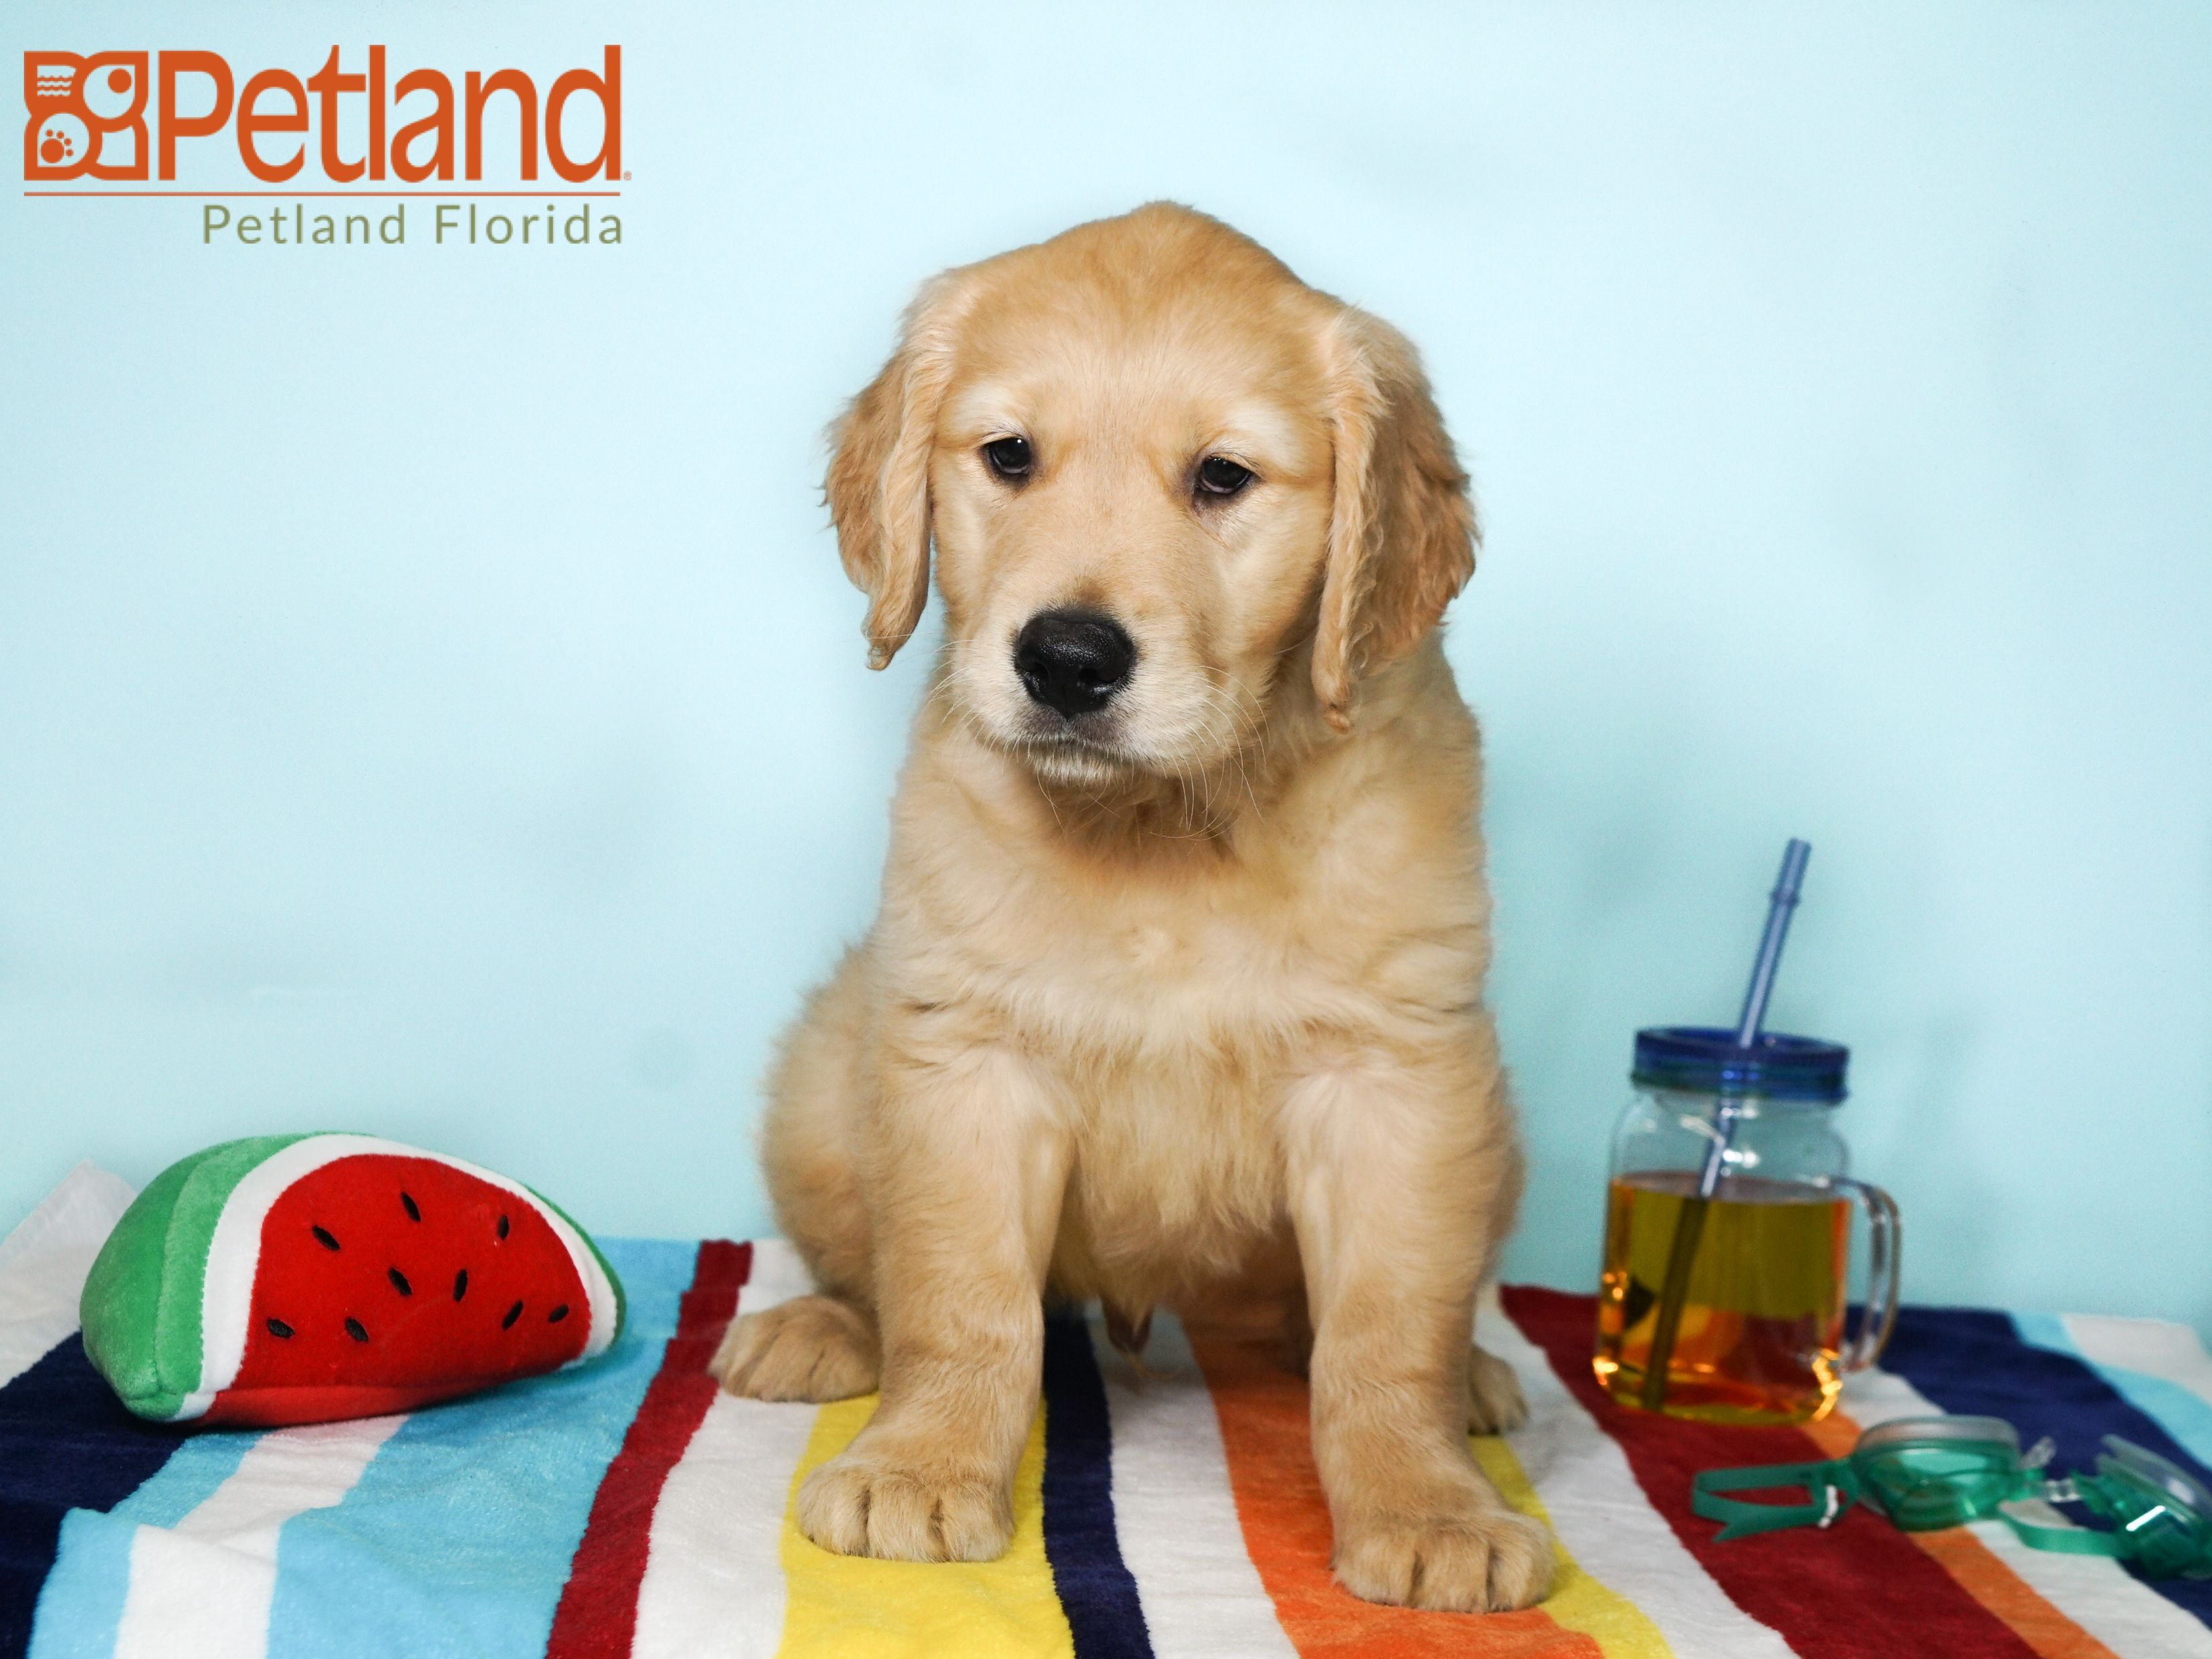 Puppies For Sale Puppies Puppies For Sale Puppy Love